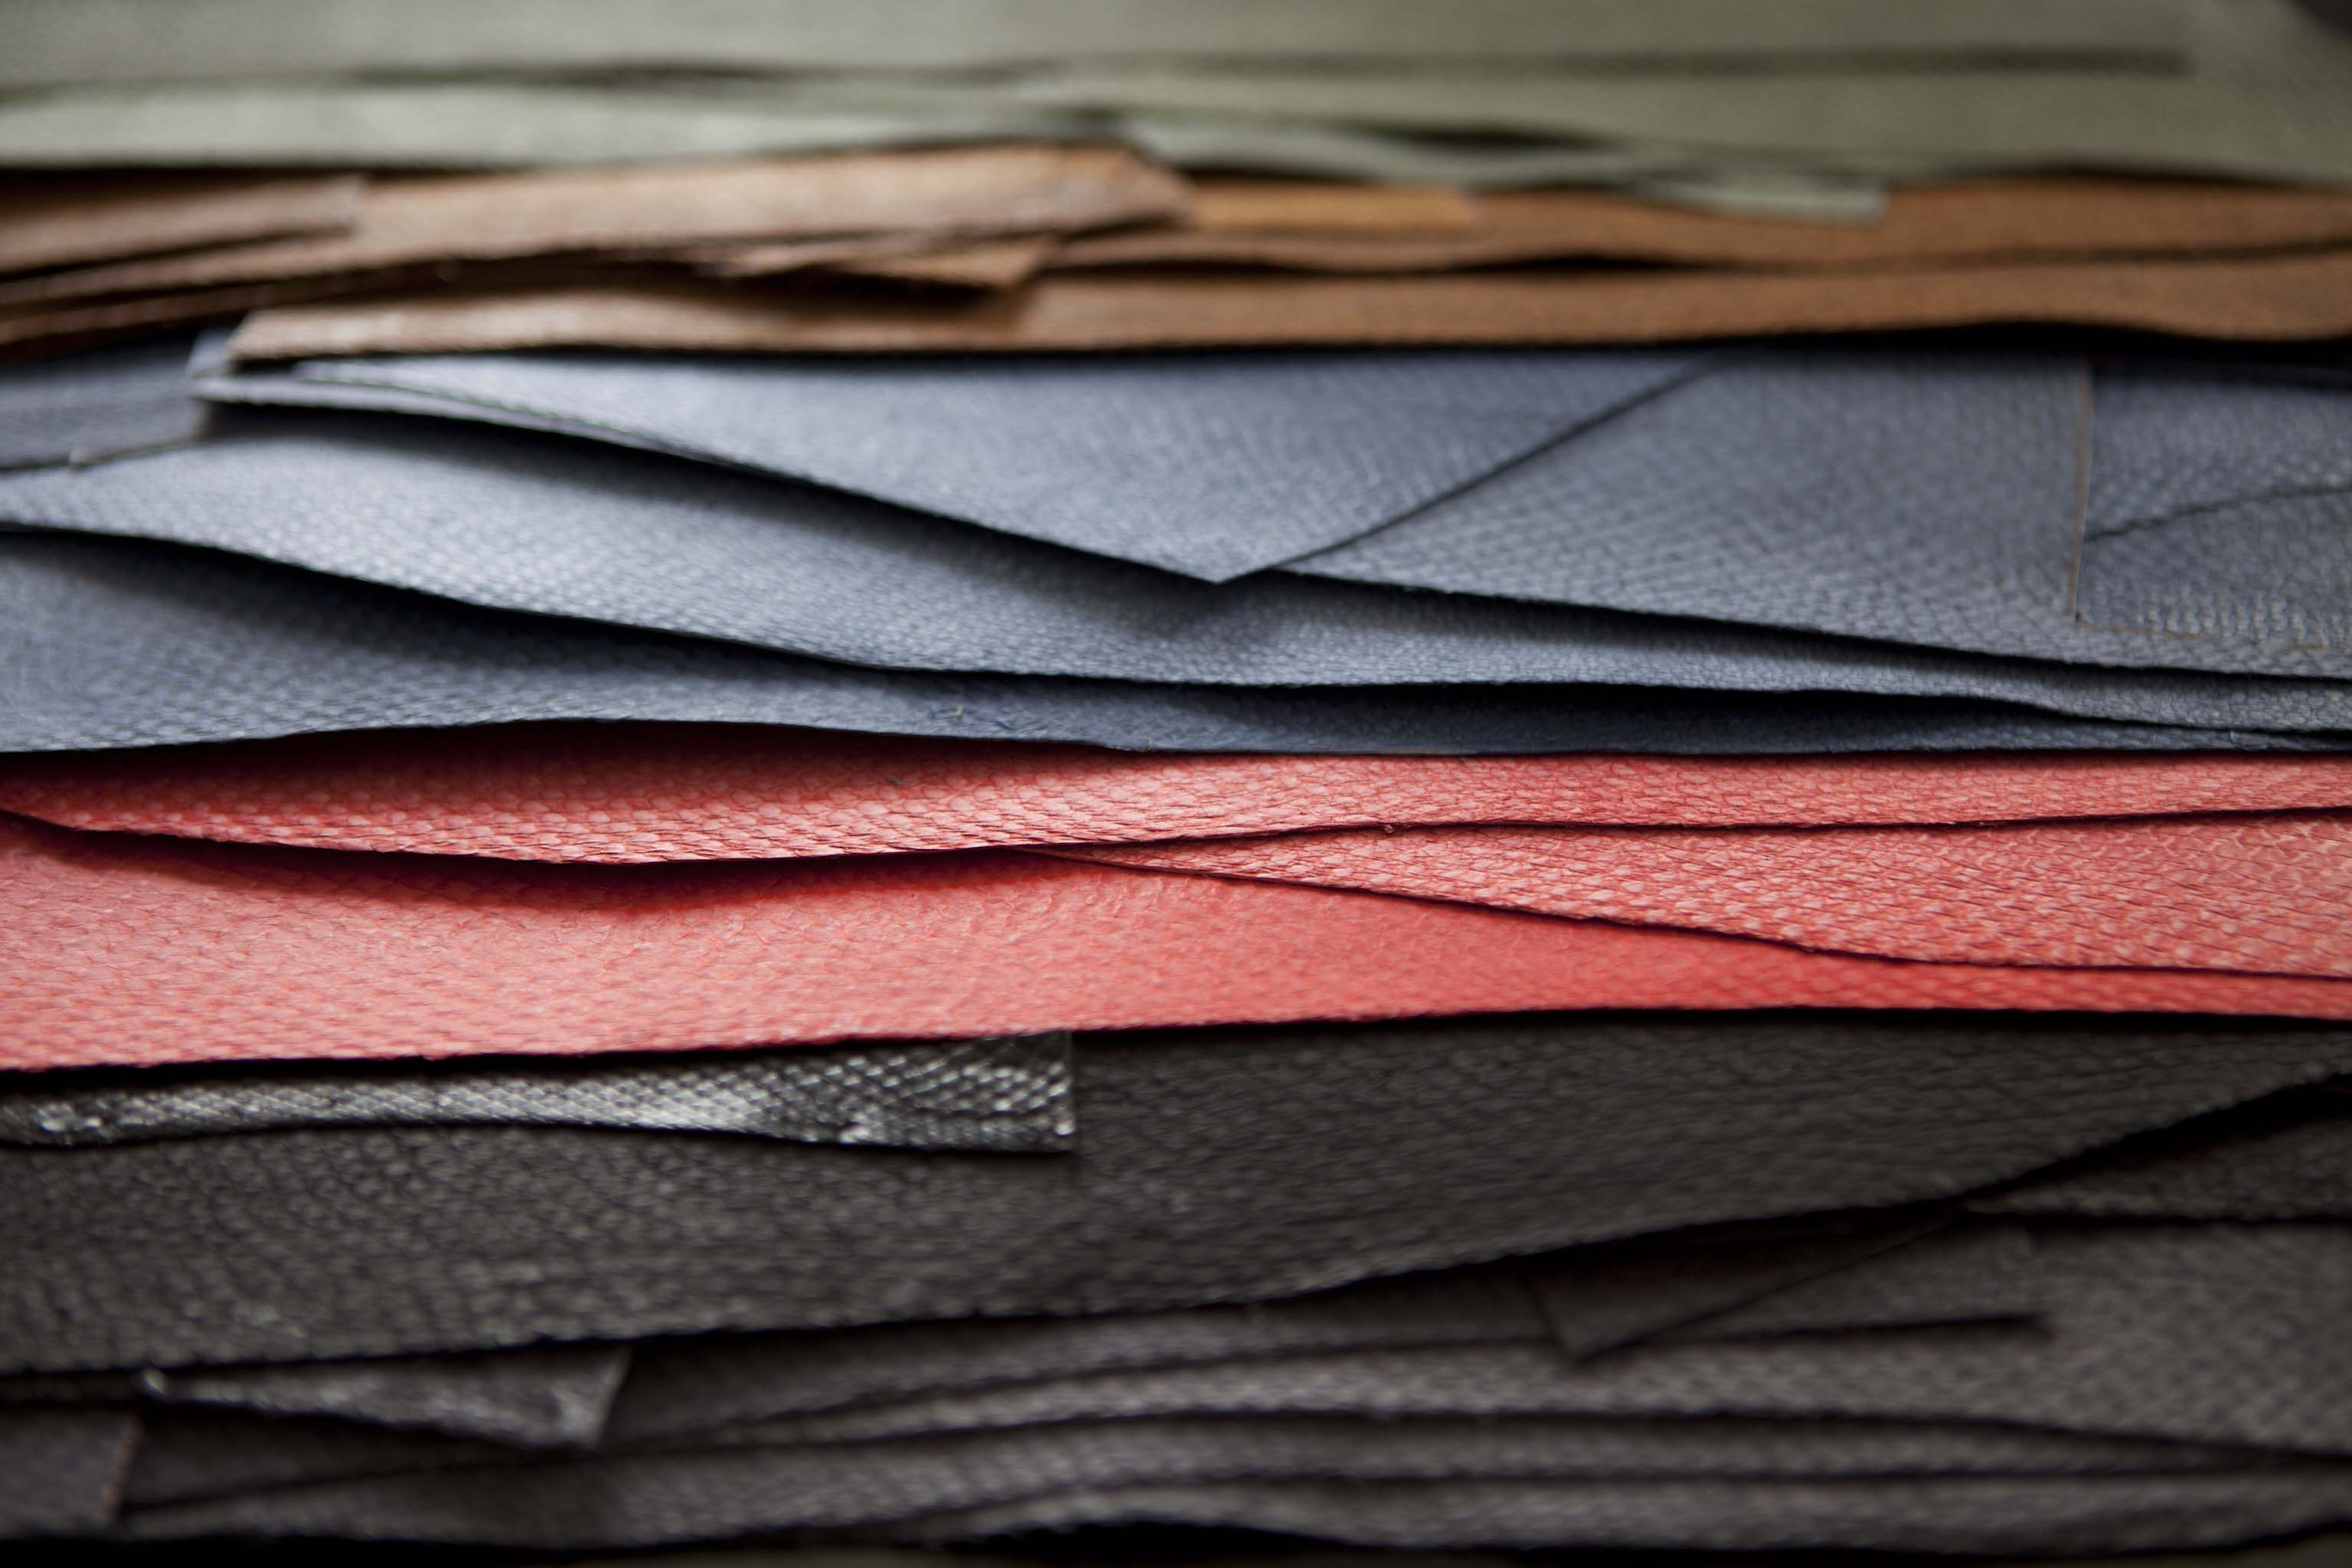 Lachsleder/salmon leather